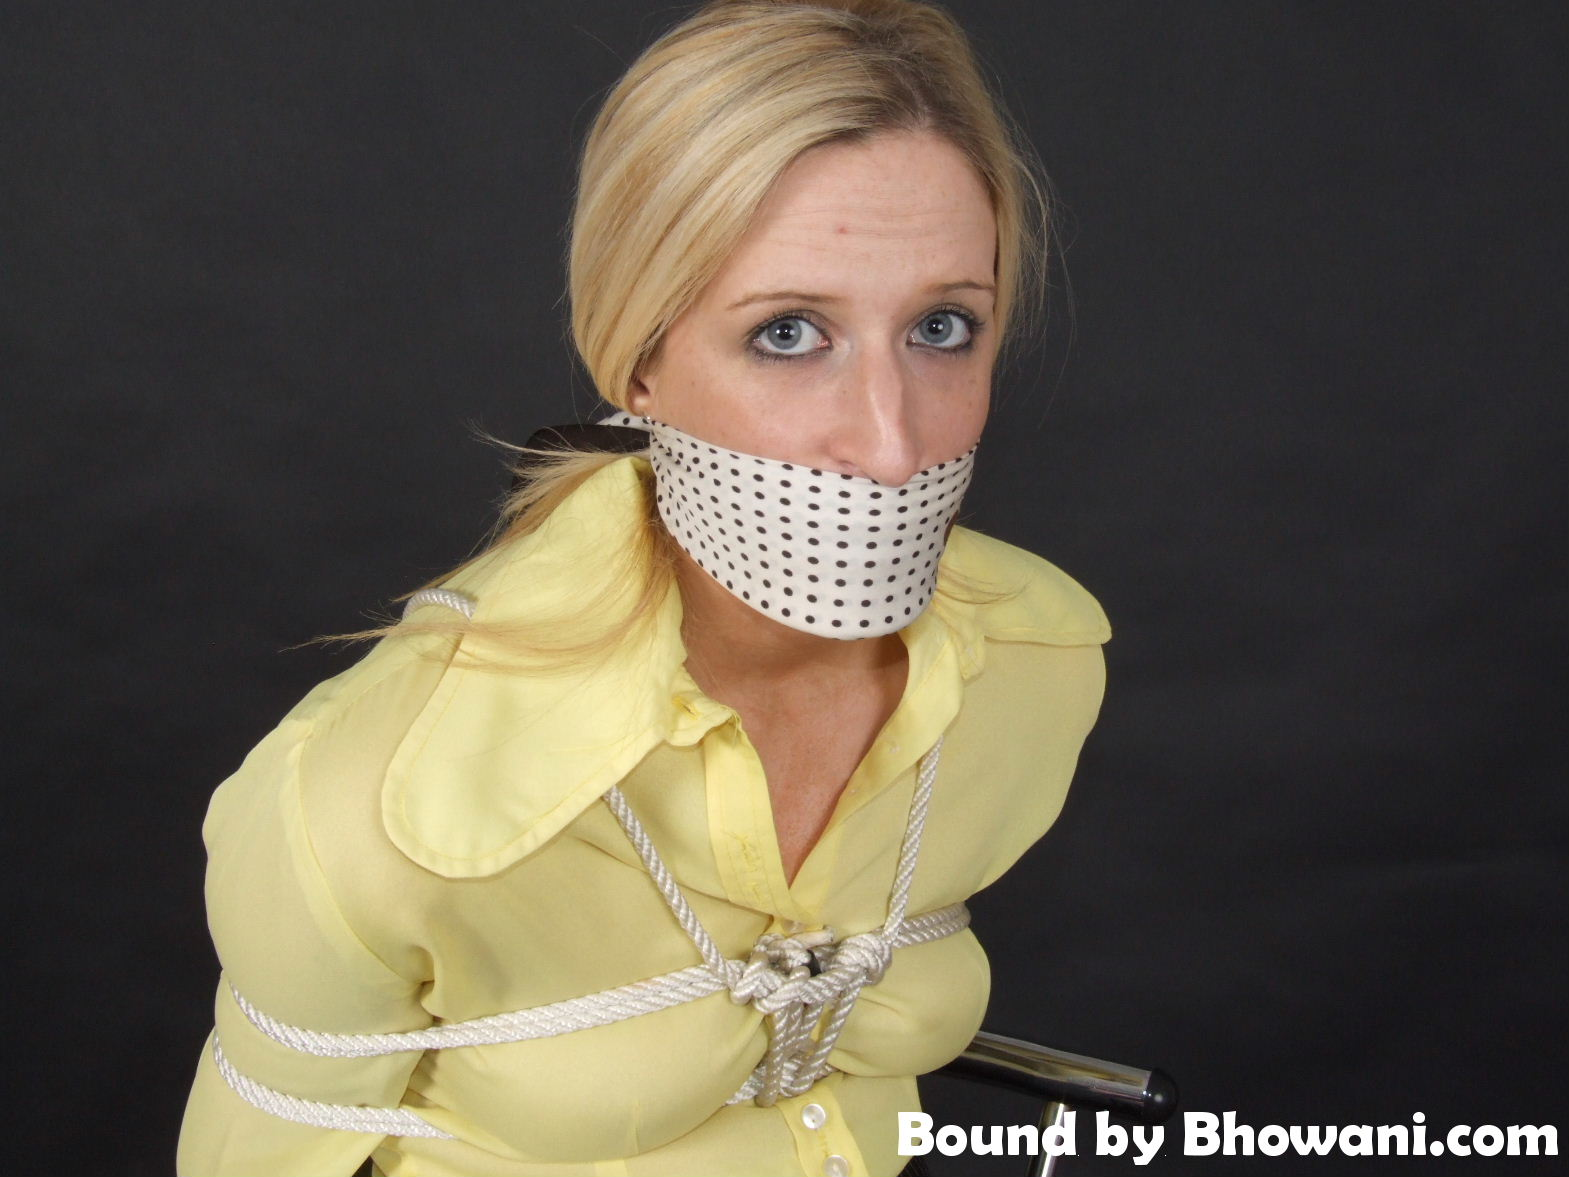 70s Collar Girl 2